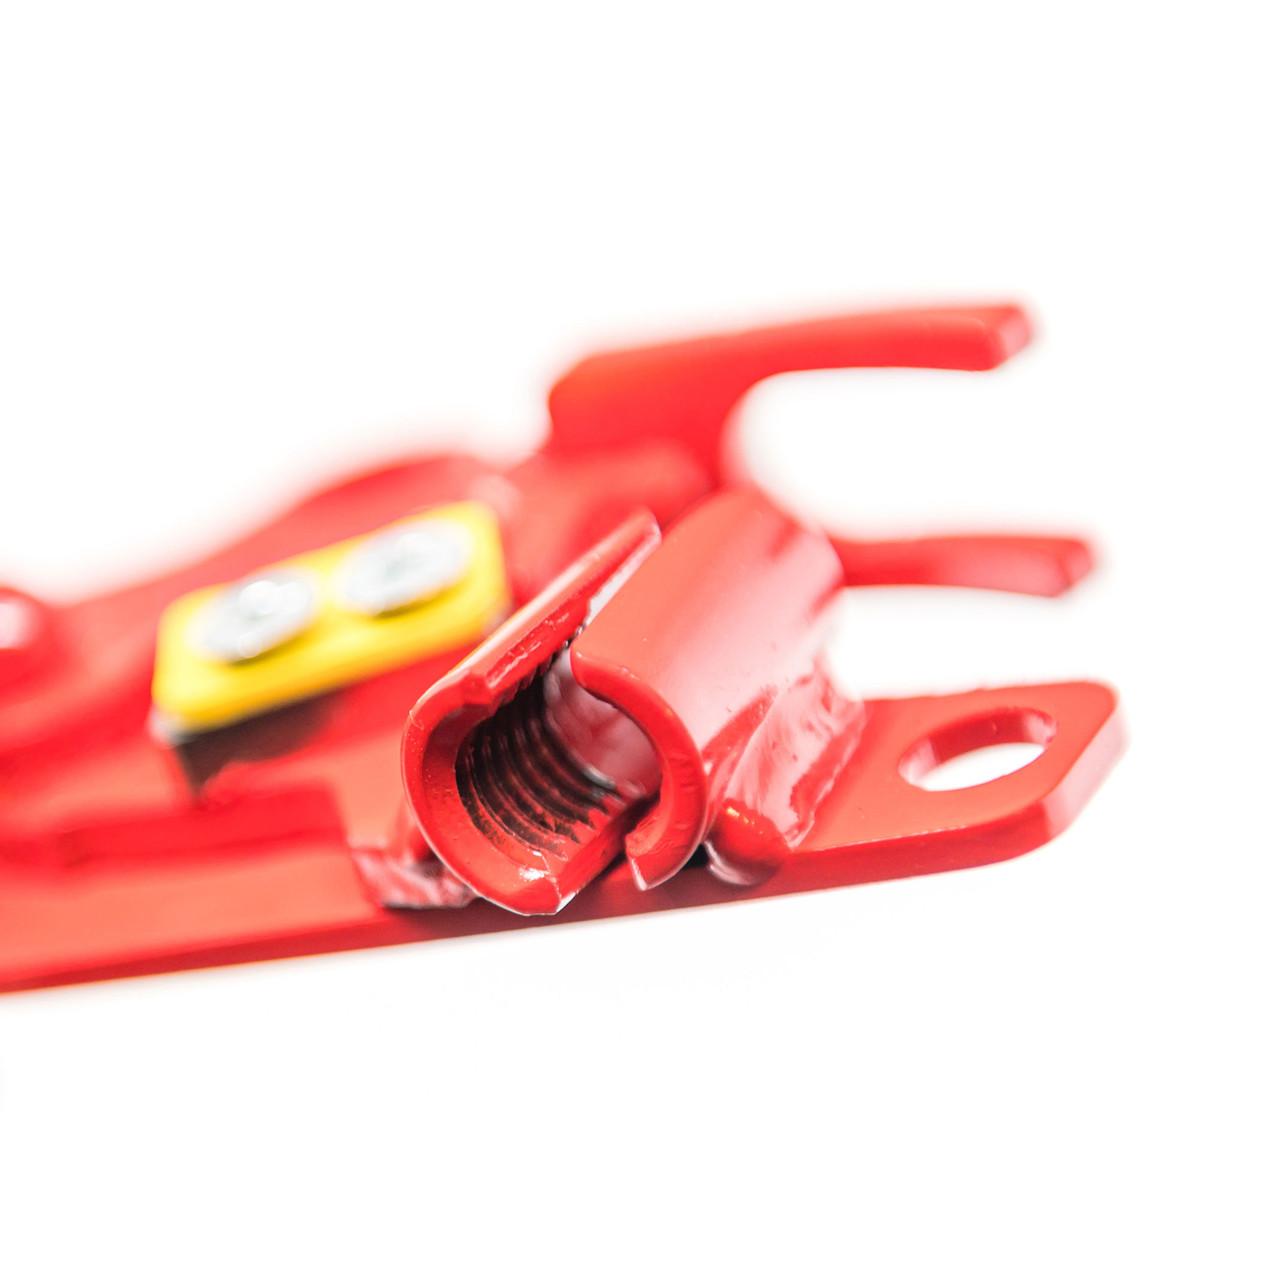 Compact One-Hand Tubing Tool